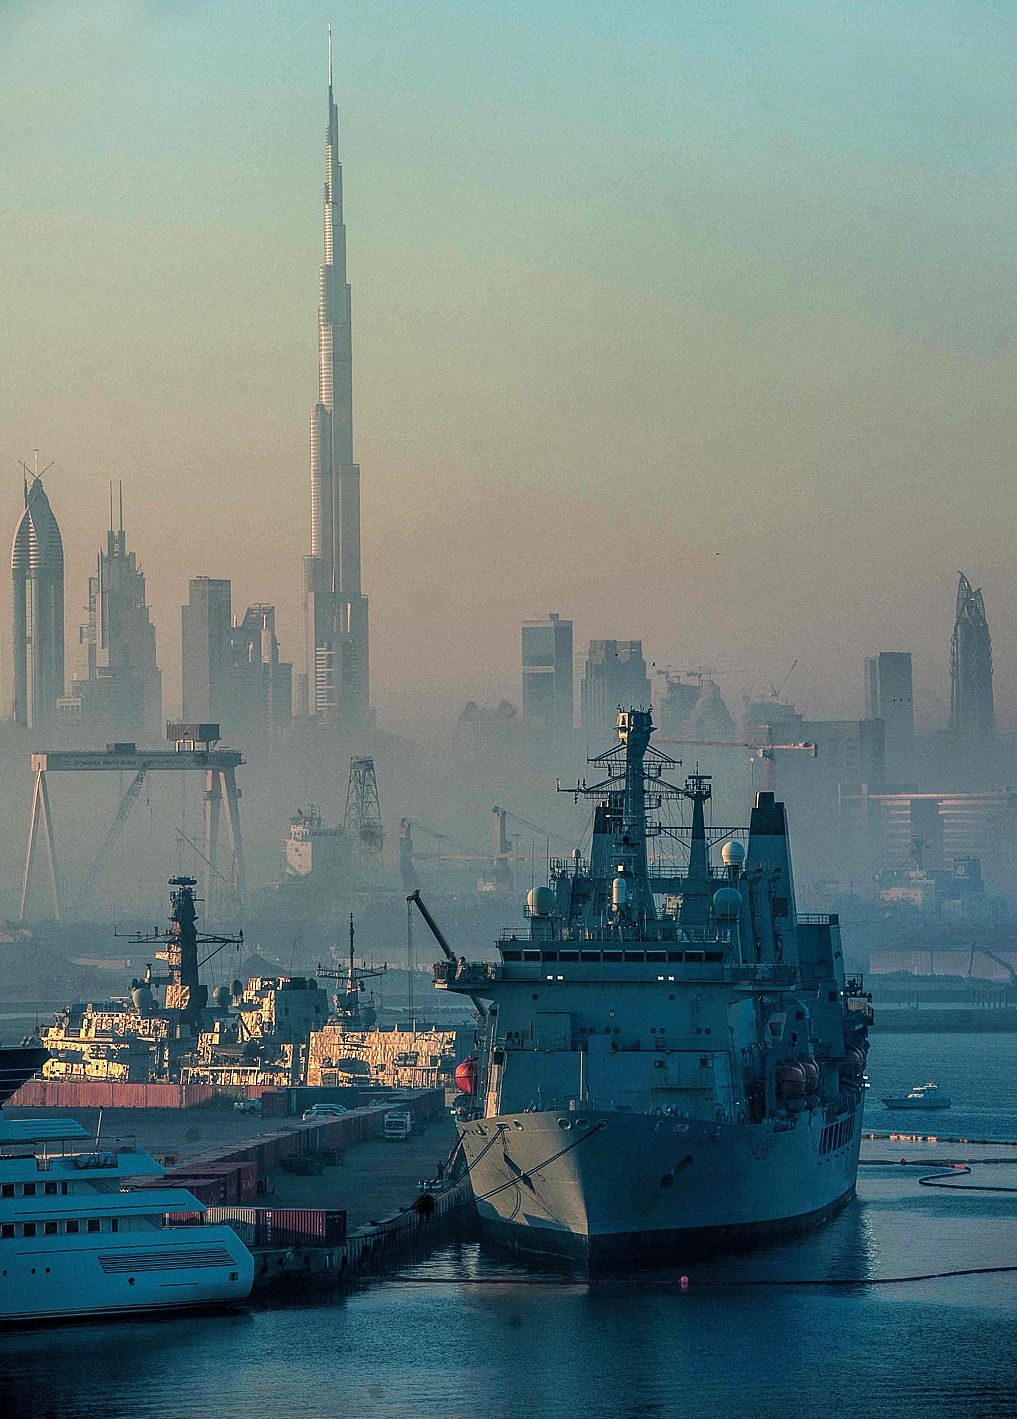 Early morning in Port Rashid, Dubai by MrBpix